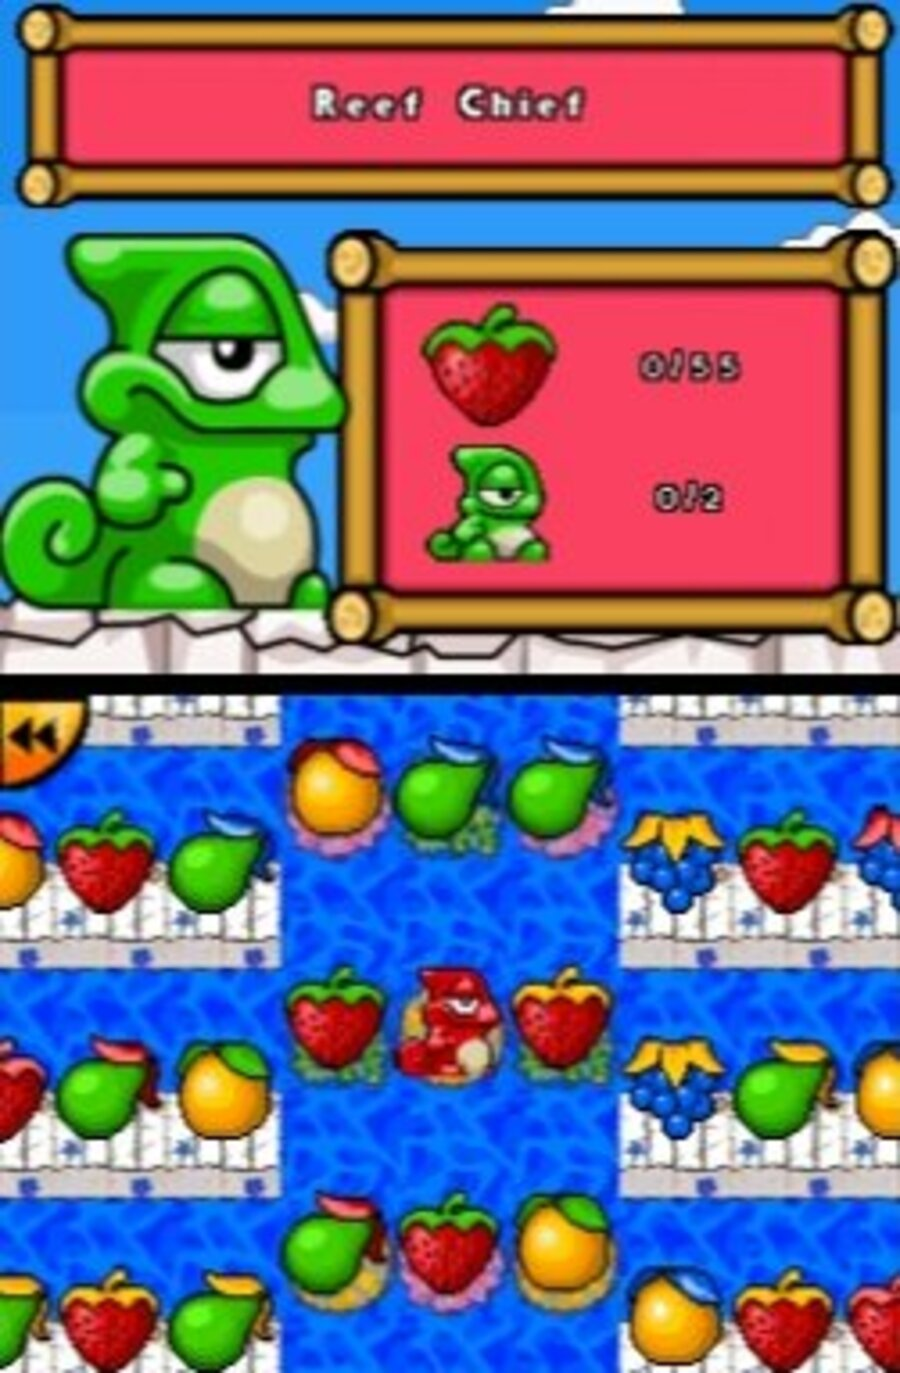 Super Yum Yum: Puzzle Adventures Screenshot